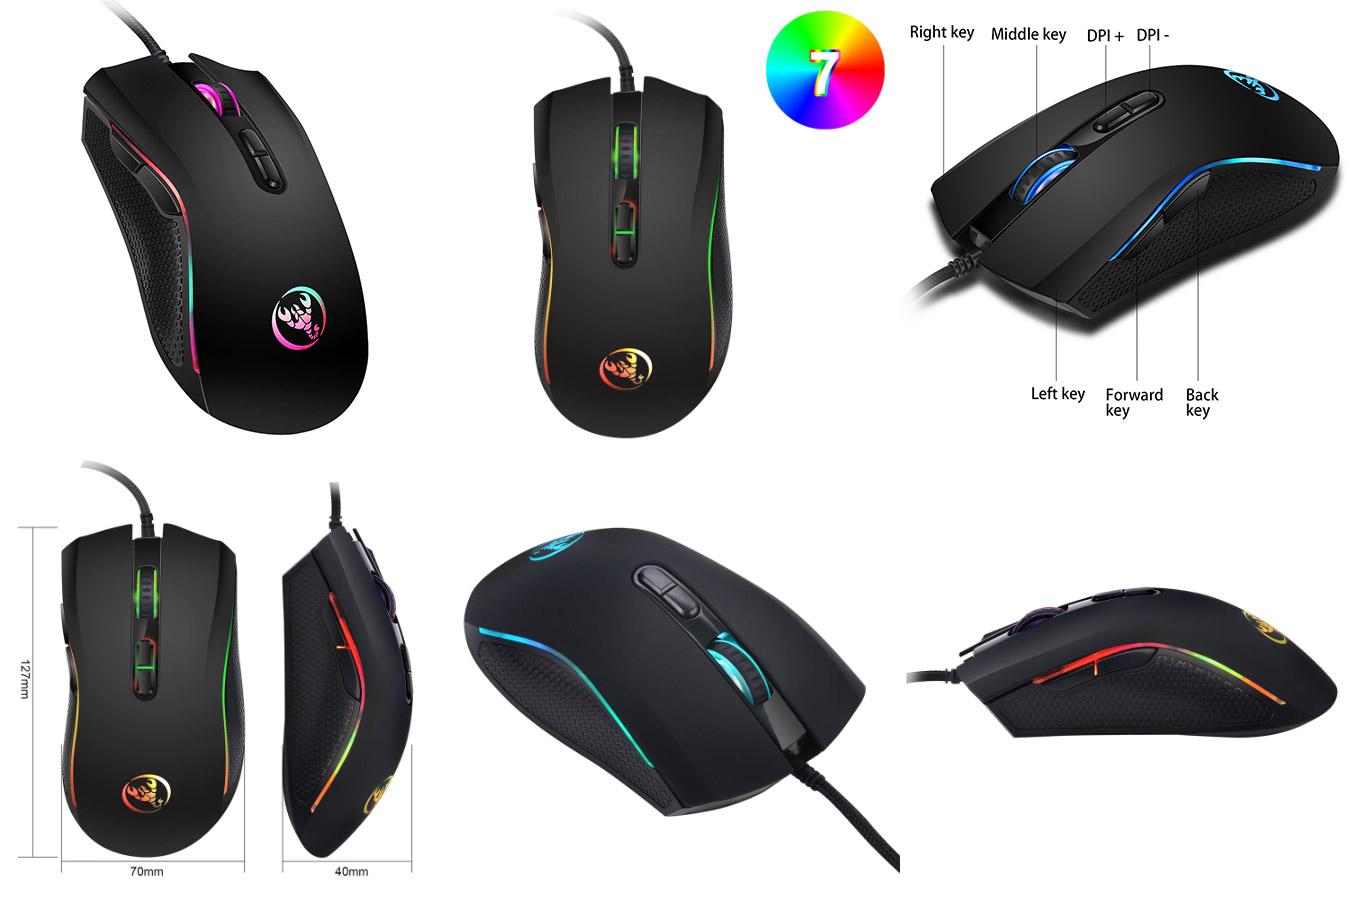 Компьютерная мышь для левши HXSJ A869